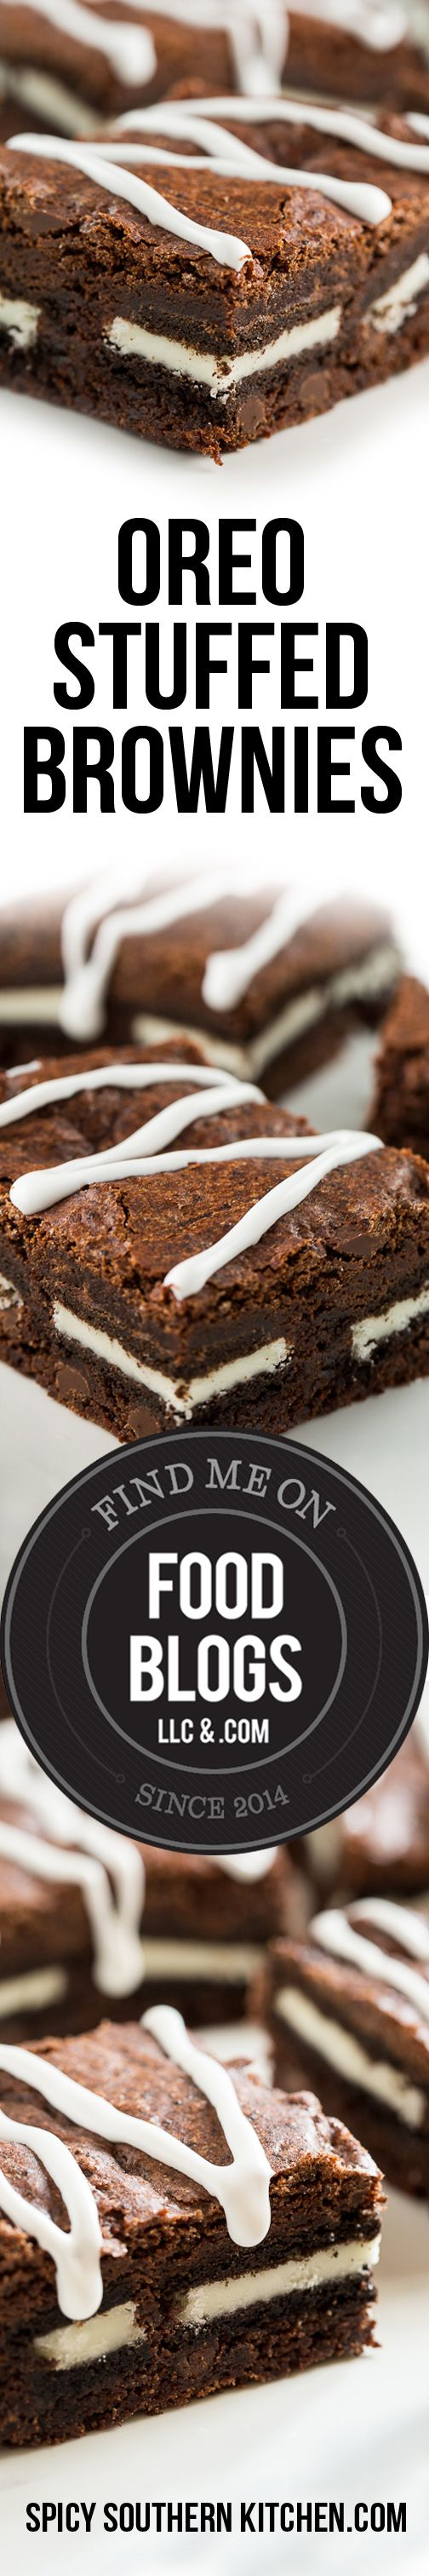 Oreo Stuffed Brownies @foodblogs / FoodBlogs.com #brownies